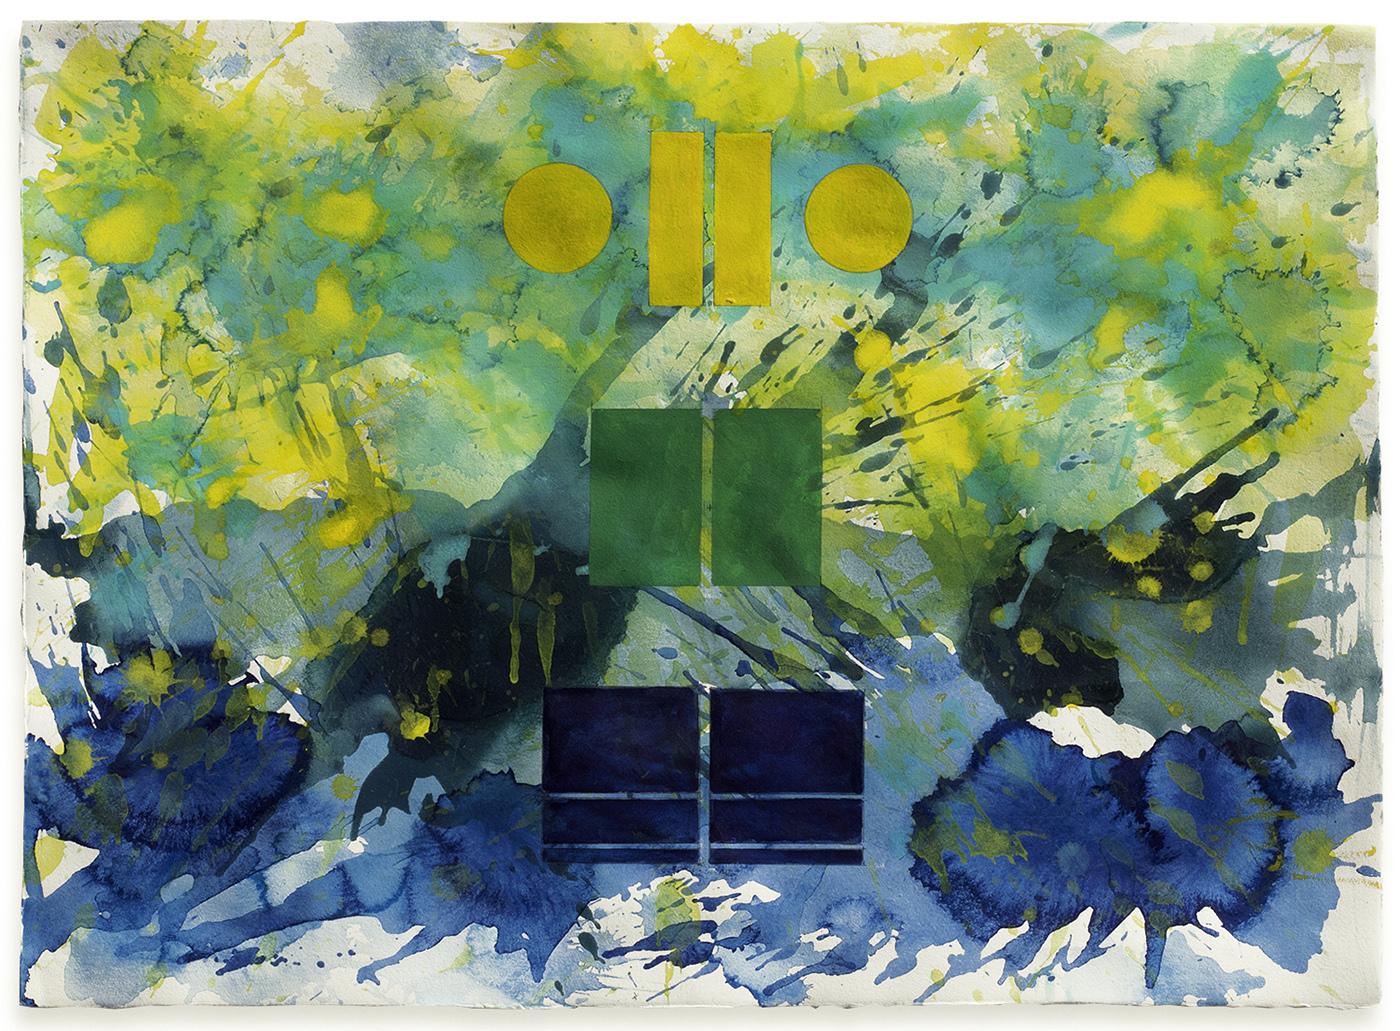 J. Steven Manolis, Palm Beach Light, 2018, Watercolor on Arches paper, 22 x 30 inches.